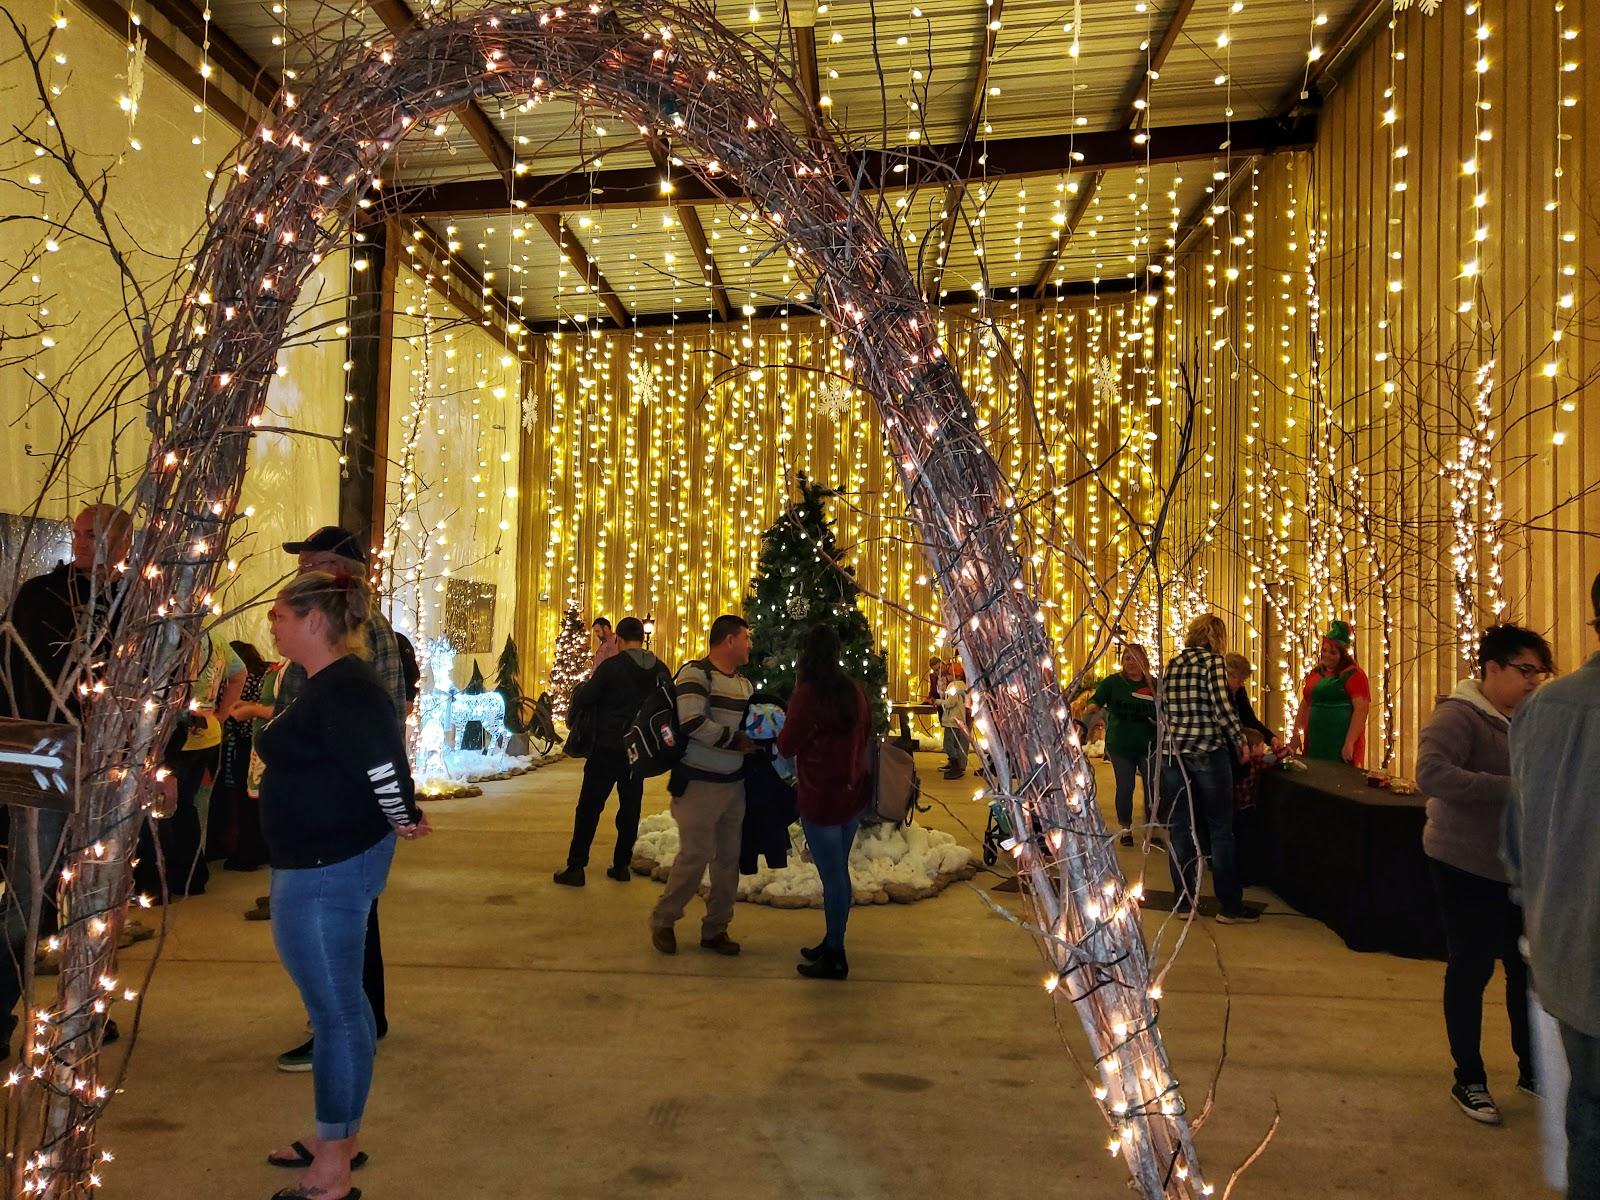 Starting the Christmas Season at The Rock Ranch